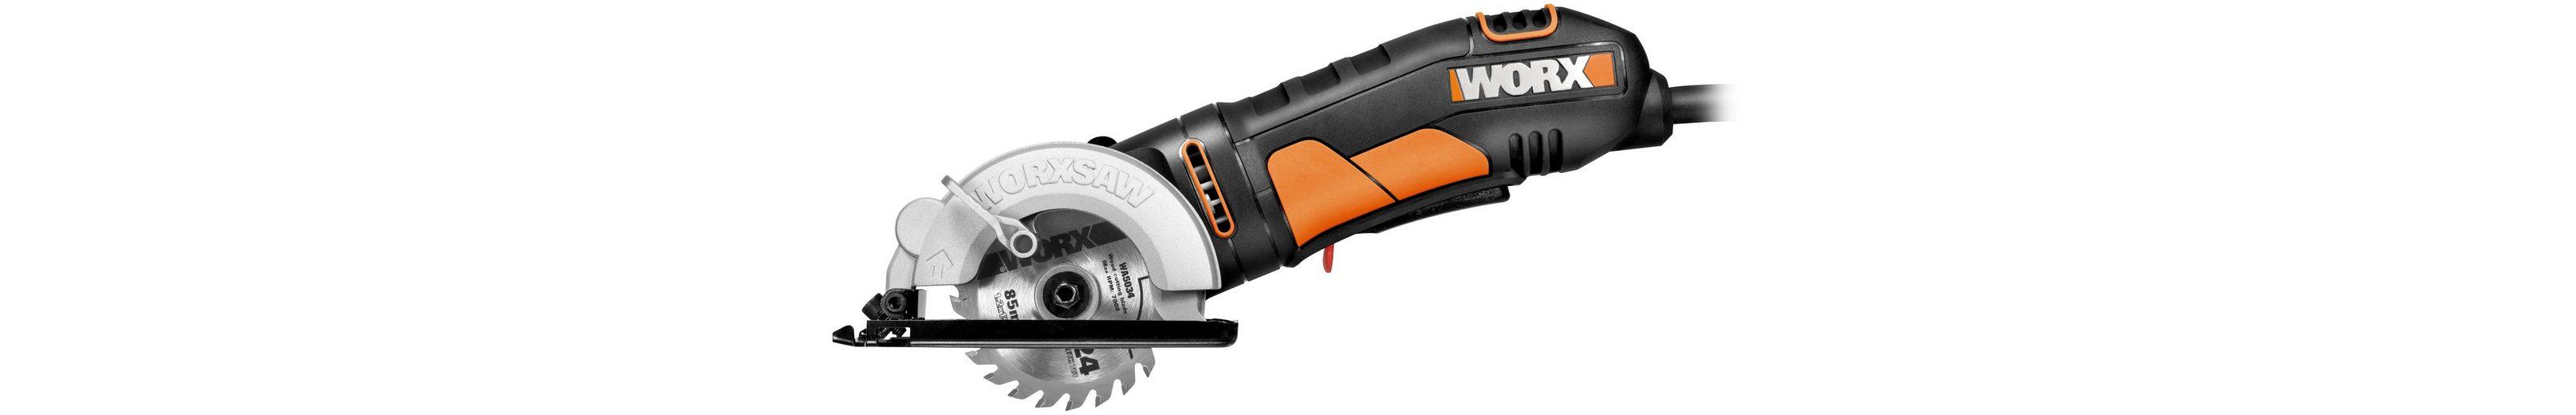 Minihandkreissäge »WX423«